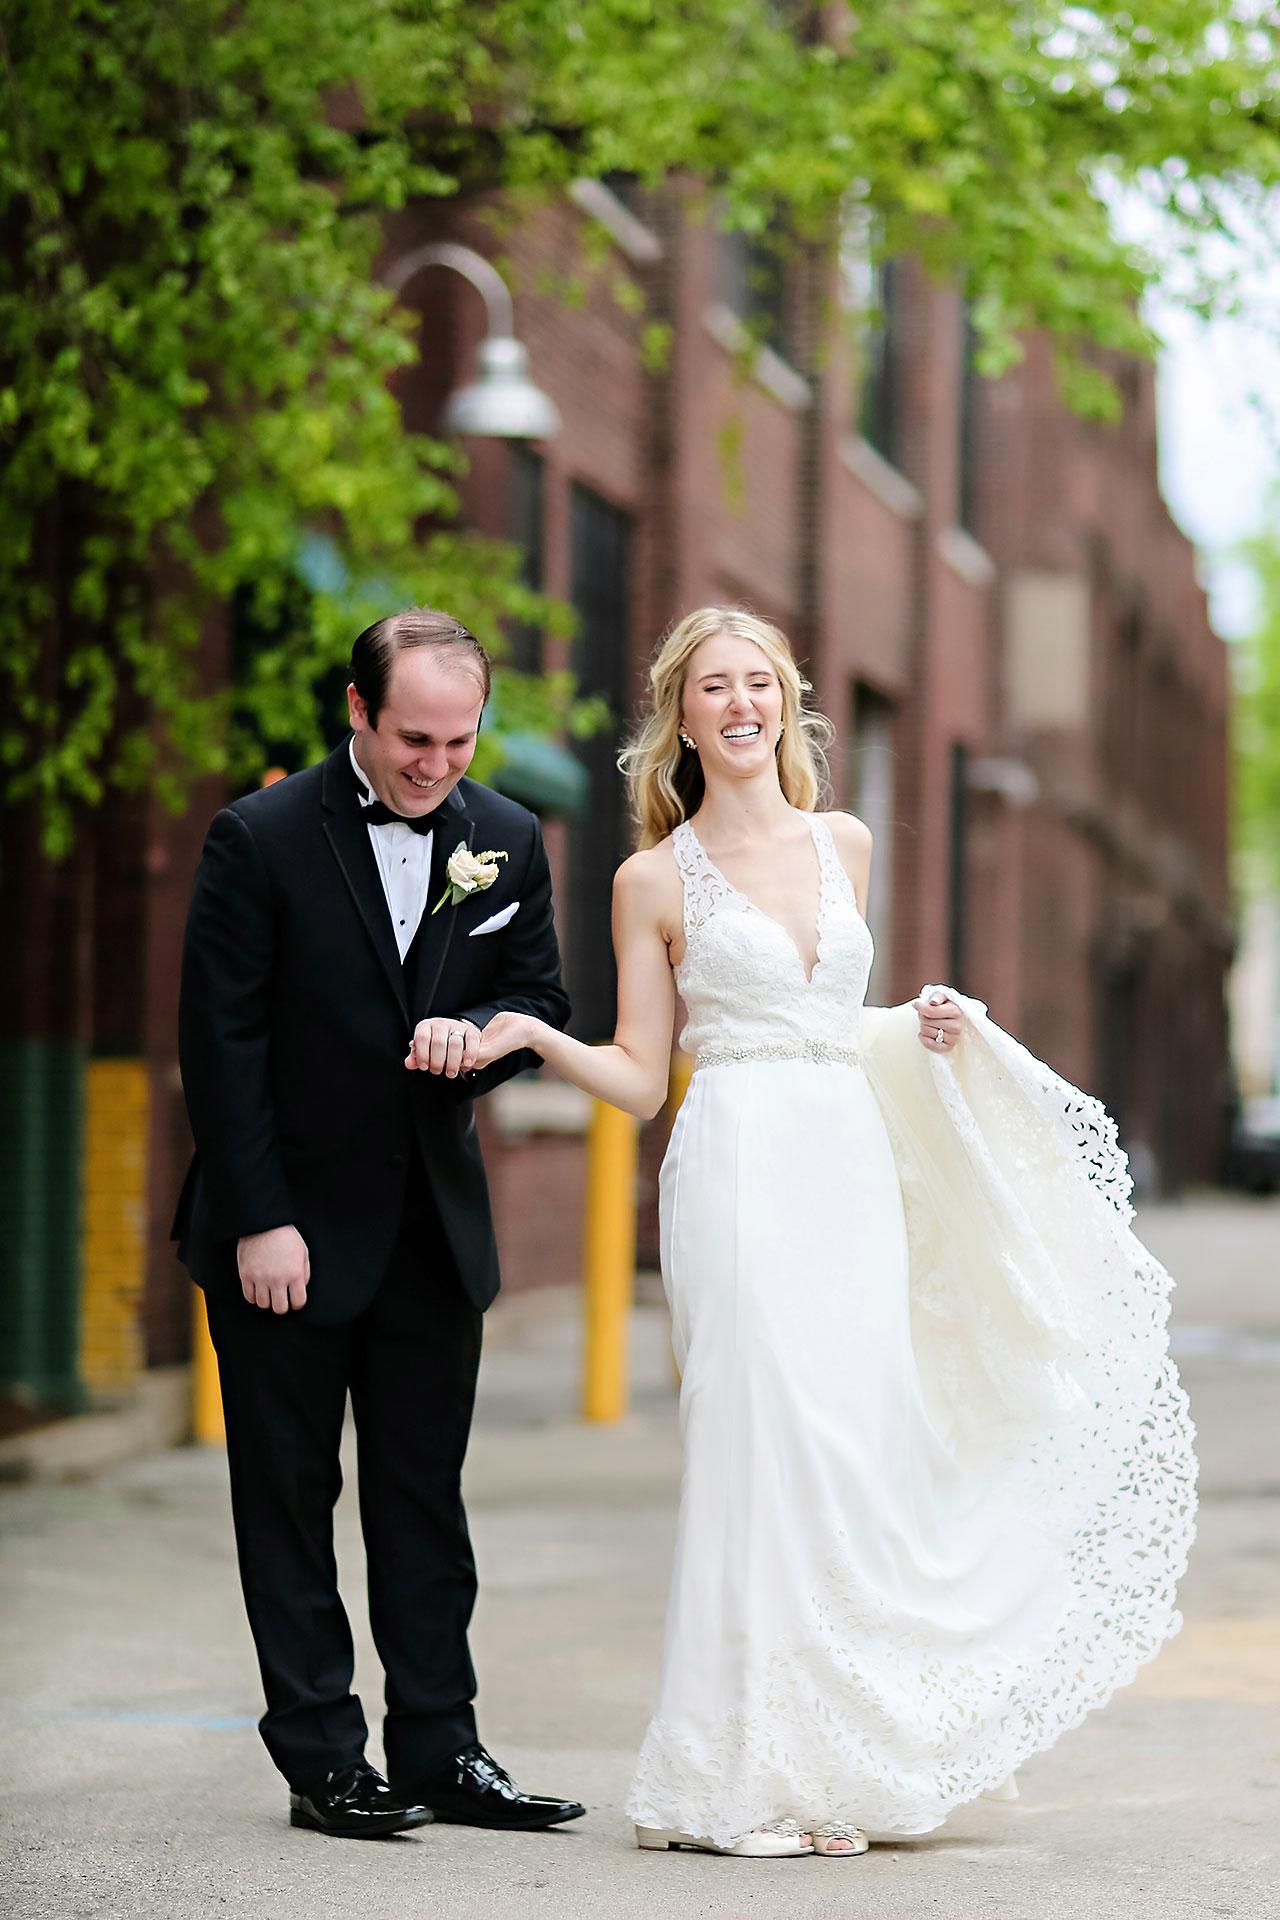 Allison Jeff Union Station Crowne Plaza Indianapolis wedding 123